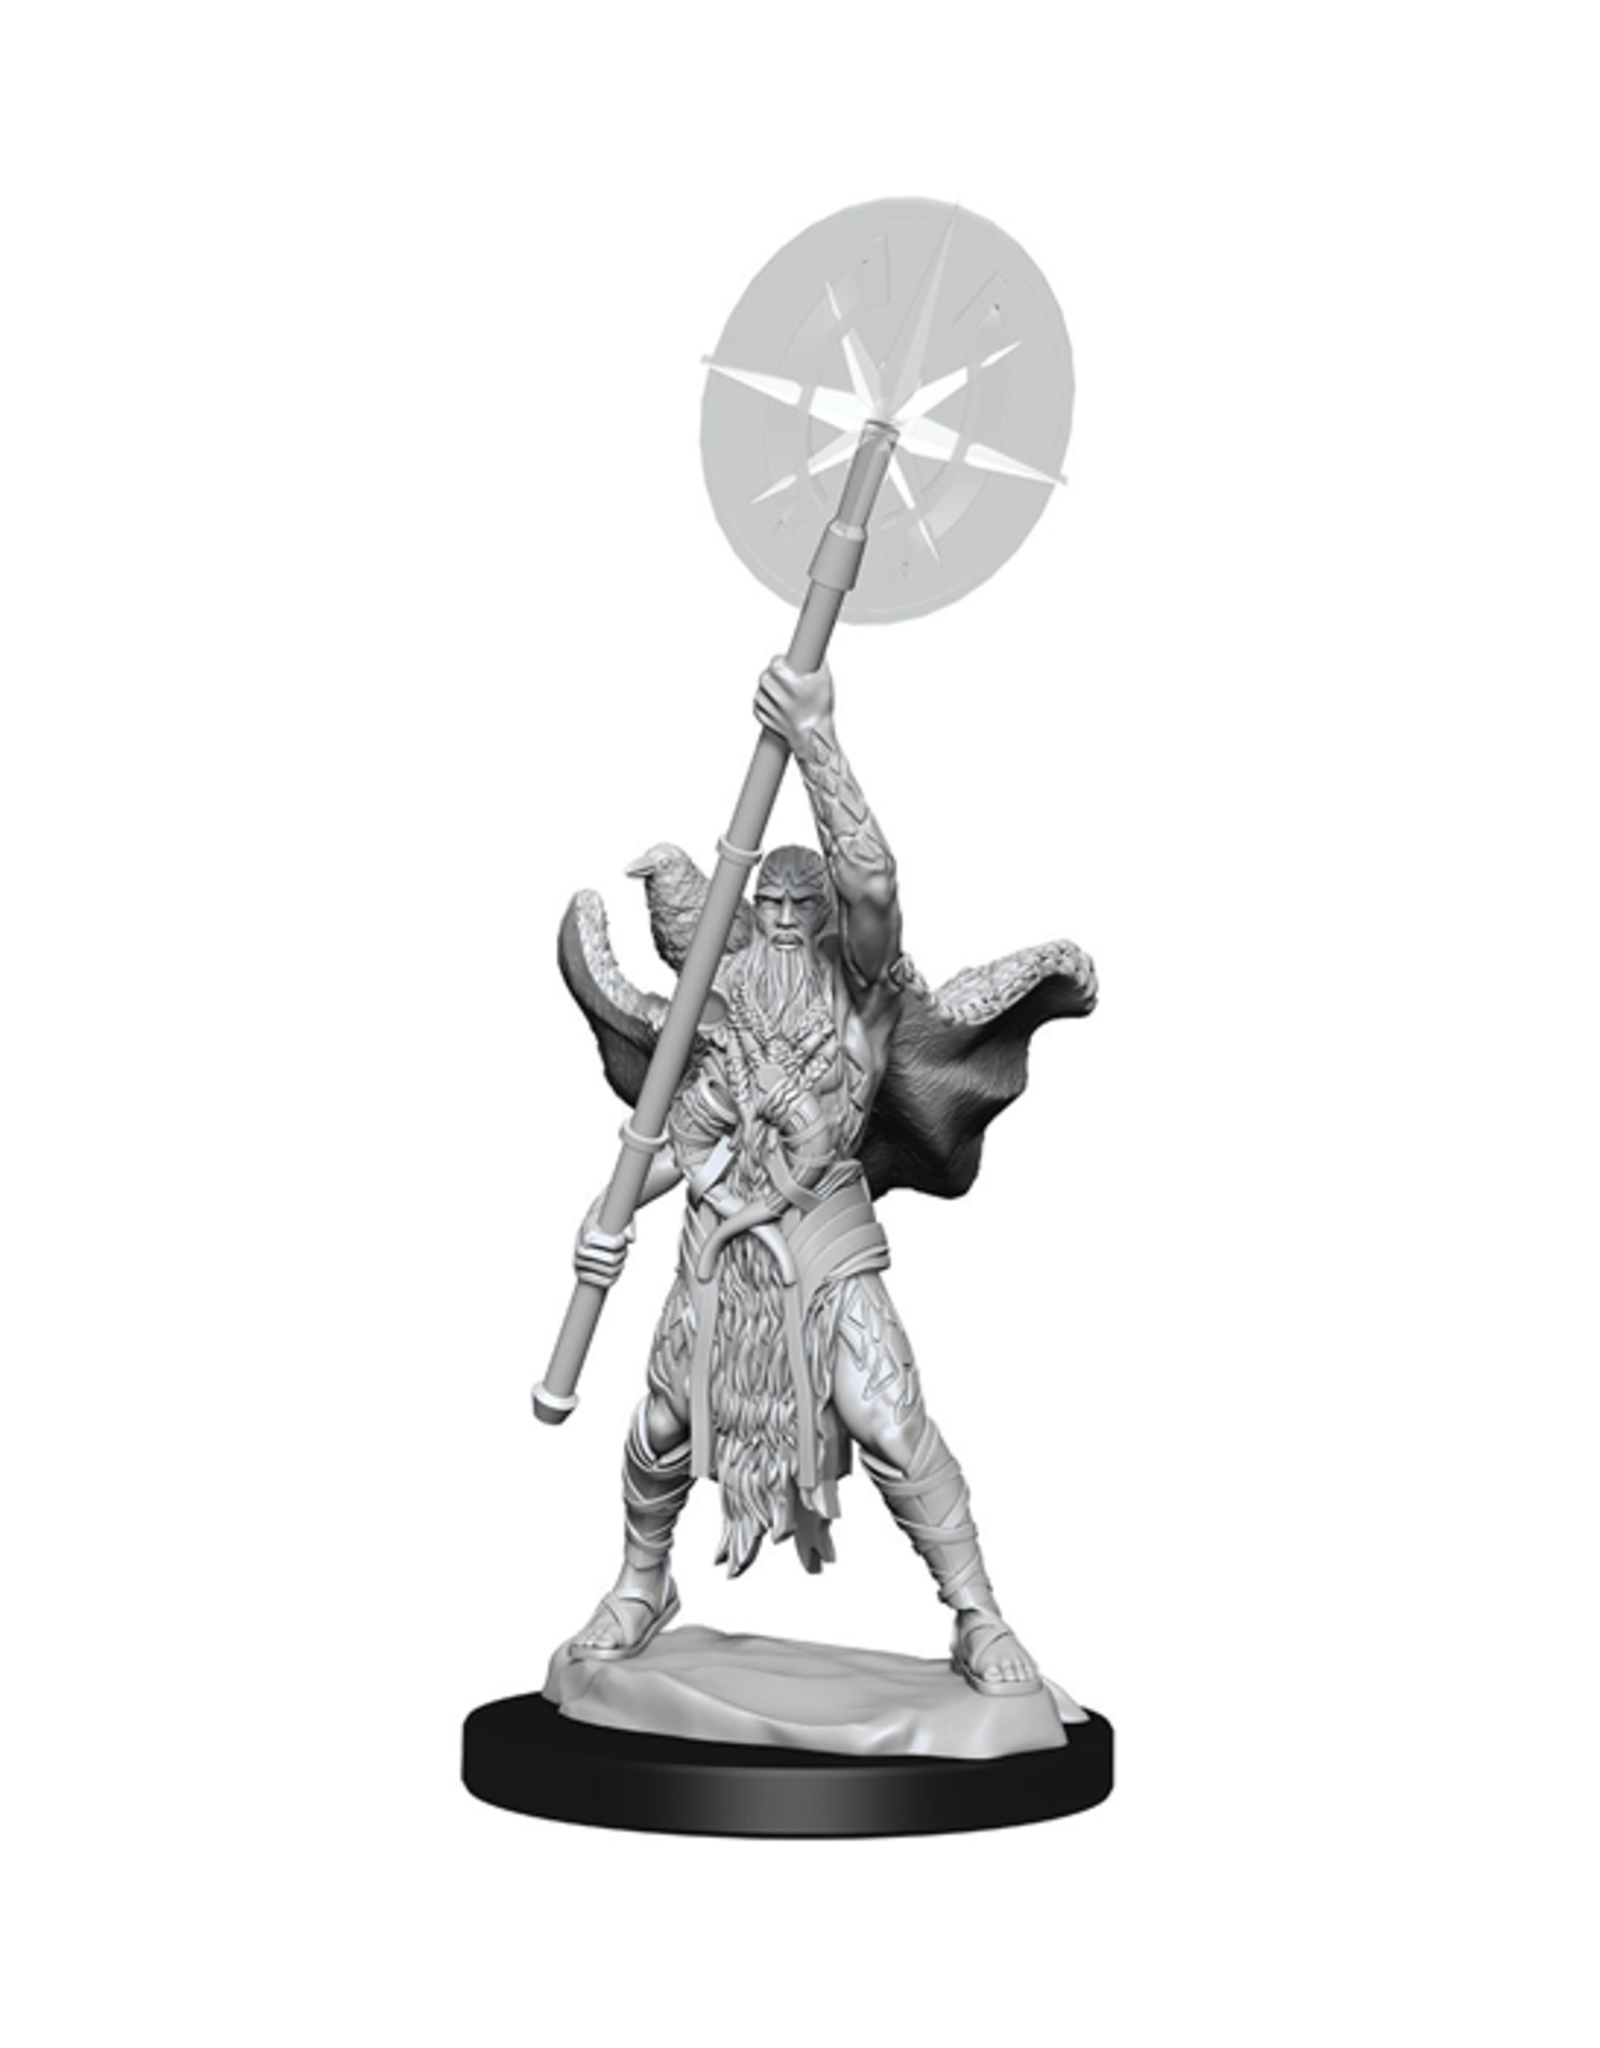 WizKids Magic: The Gathering - Unpainted Miniatures - Alrund, God of Wisdom